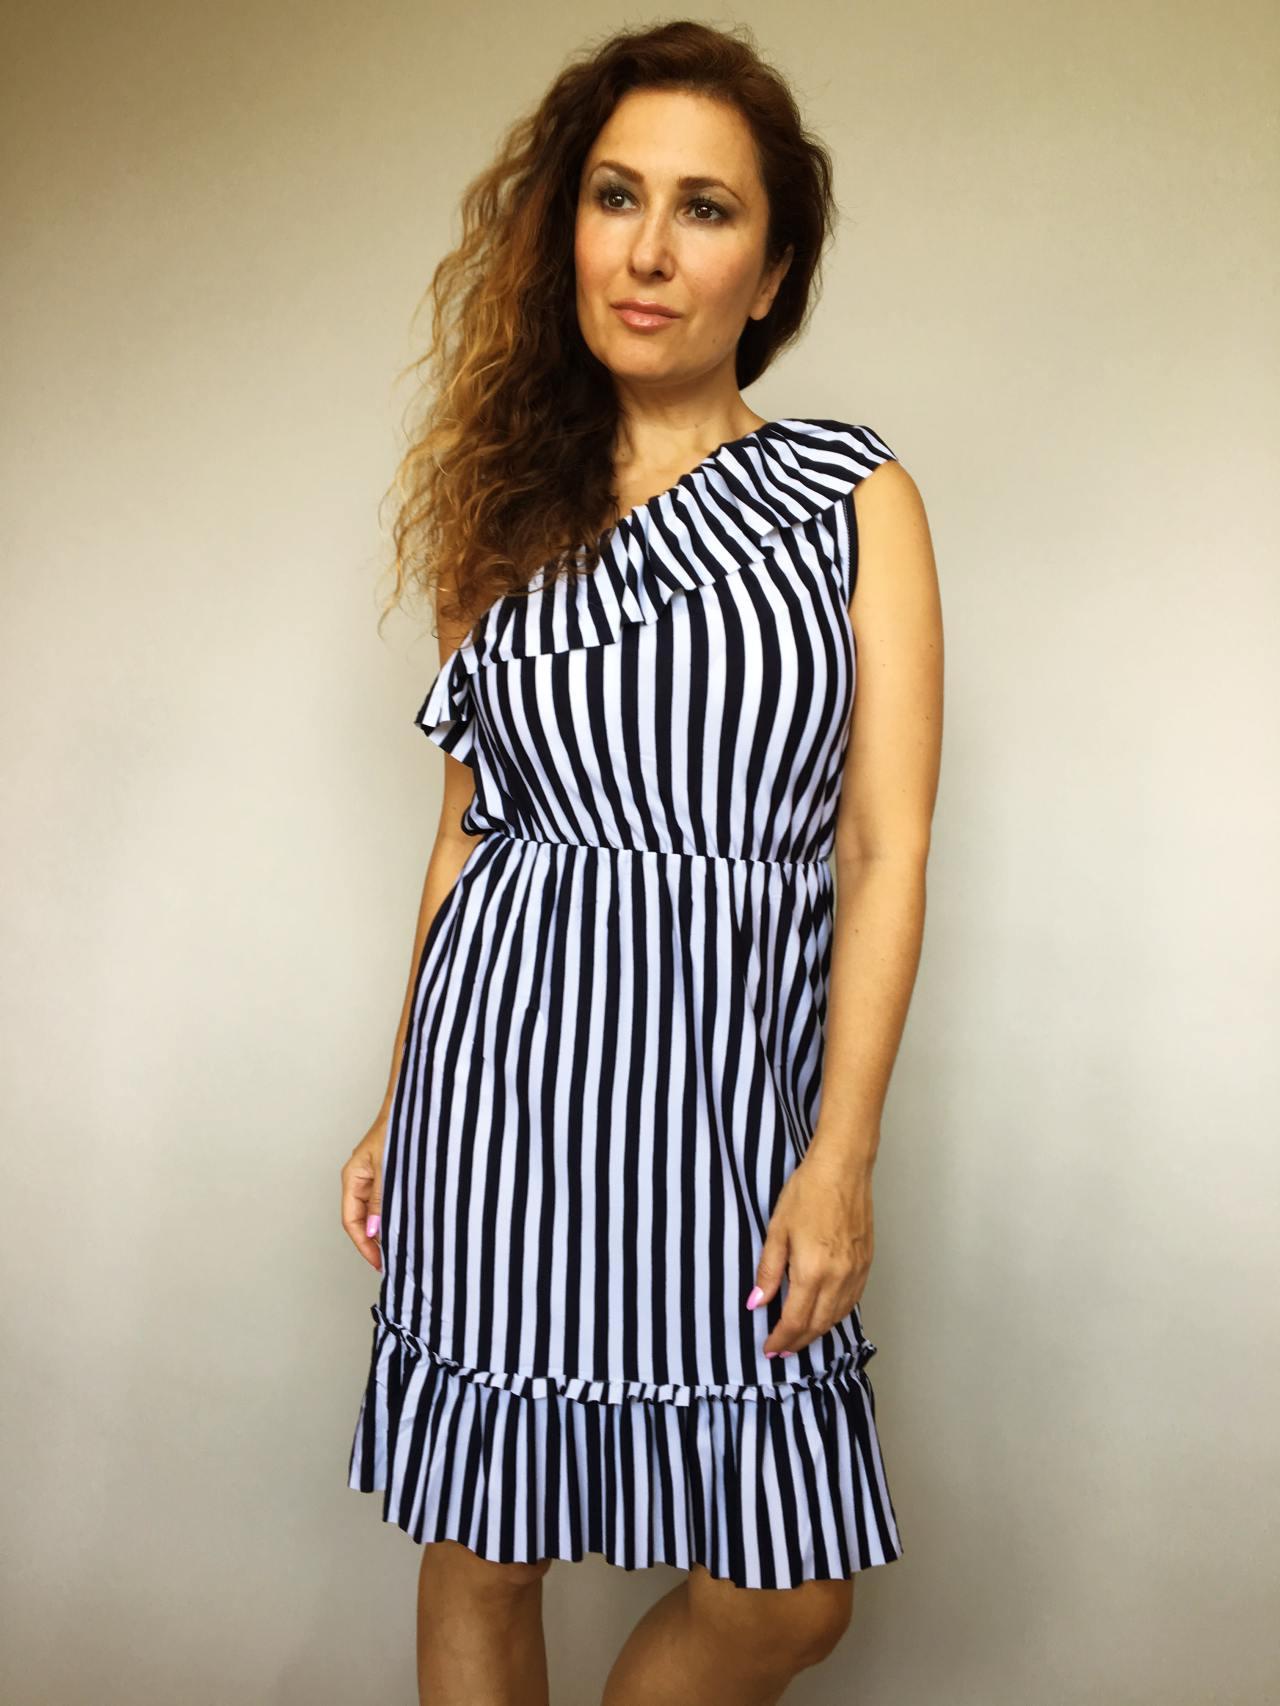 Šaty Corrie bílo modré 04